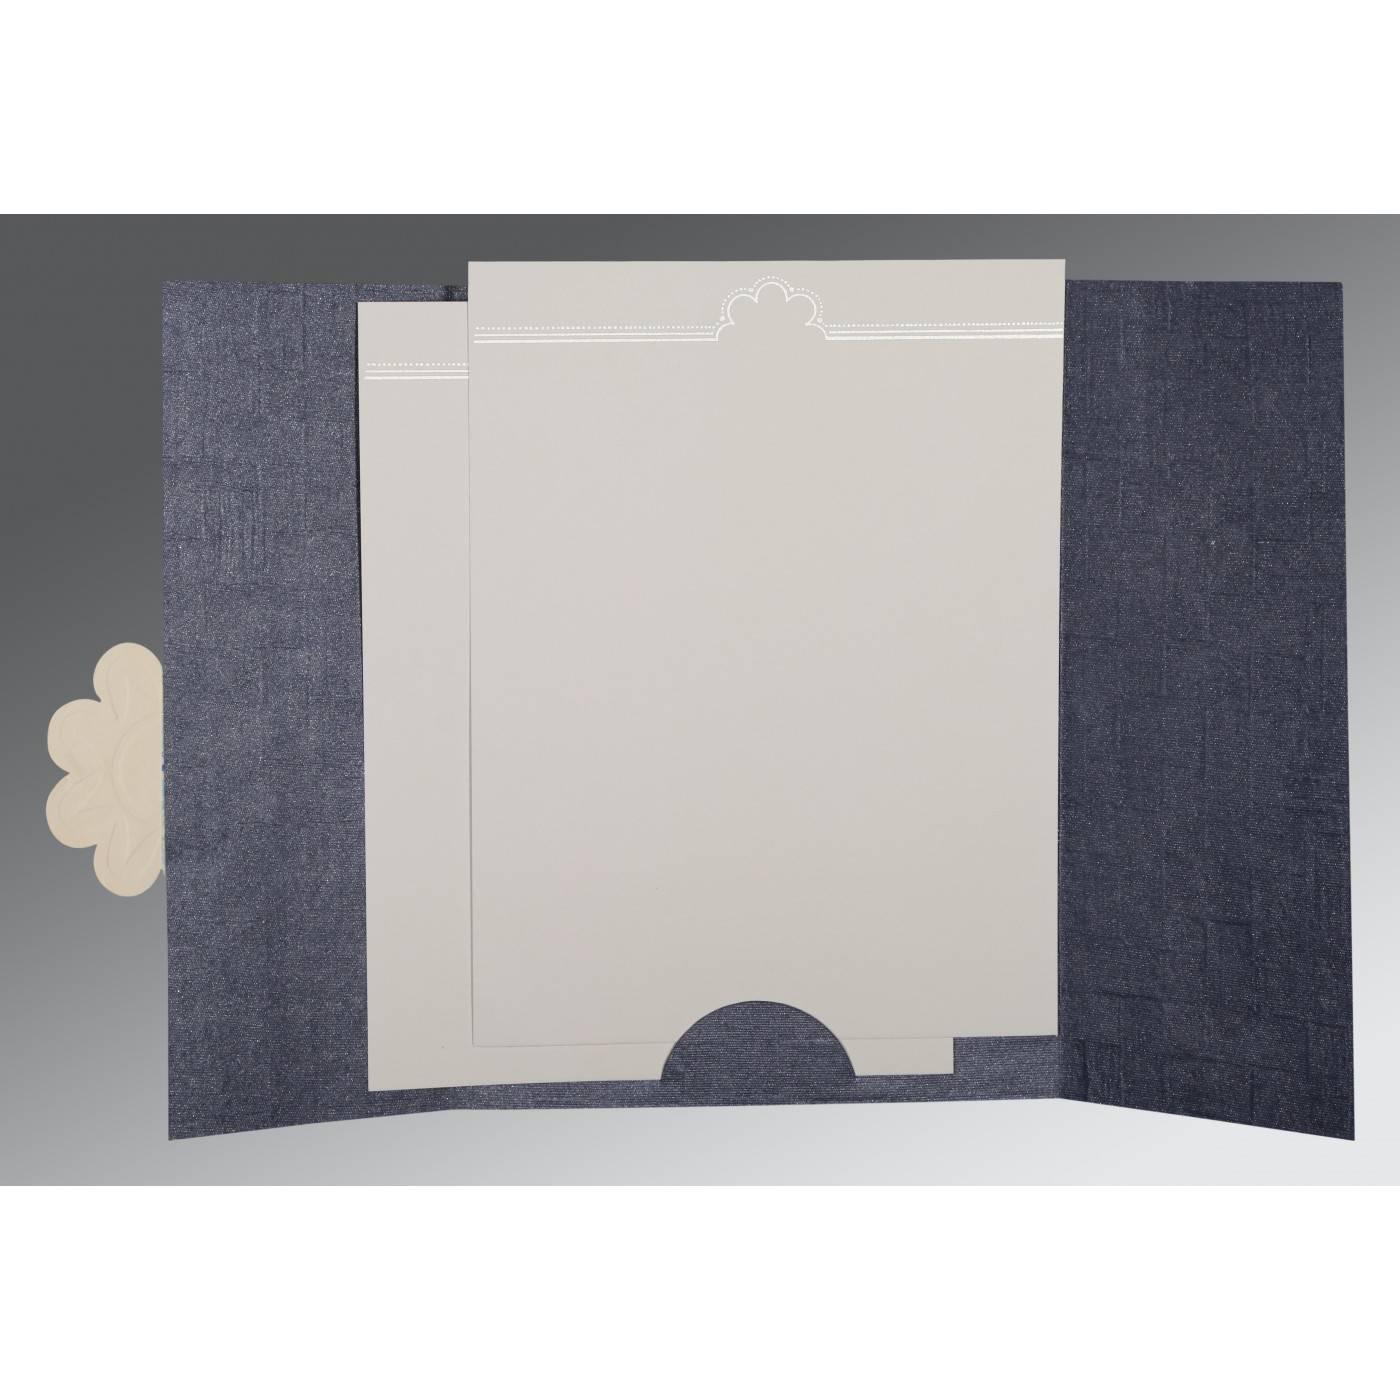 GRAYISH BLUE MATTE FLORAL THEMED - EMBOSSED WEDDING CARD : CD-1285 - IndianWeddingCards